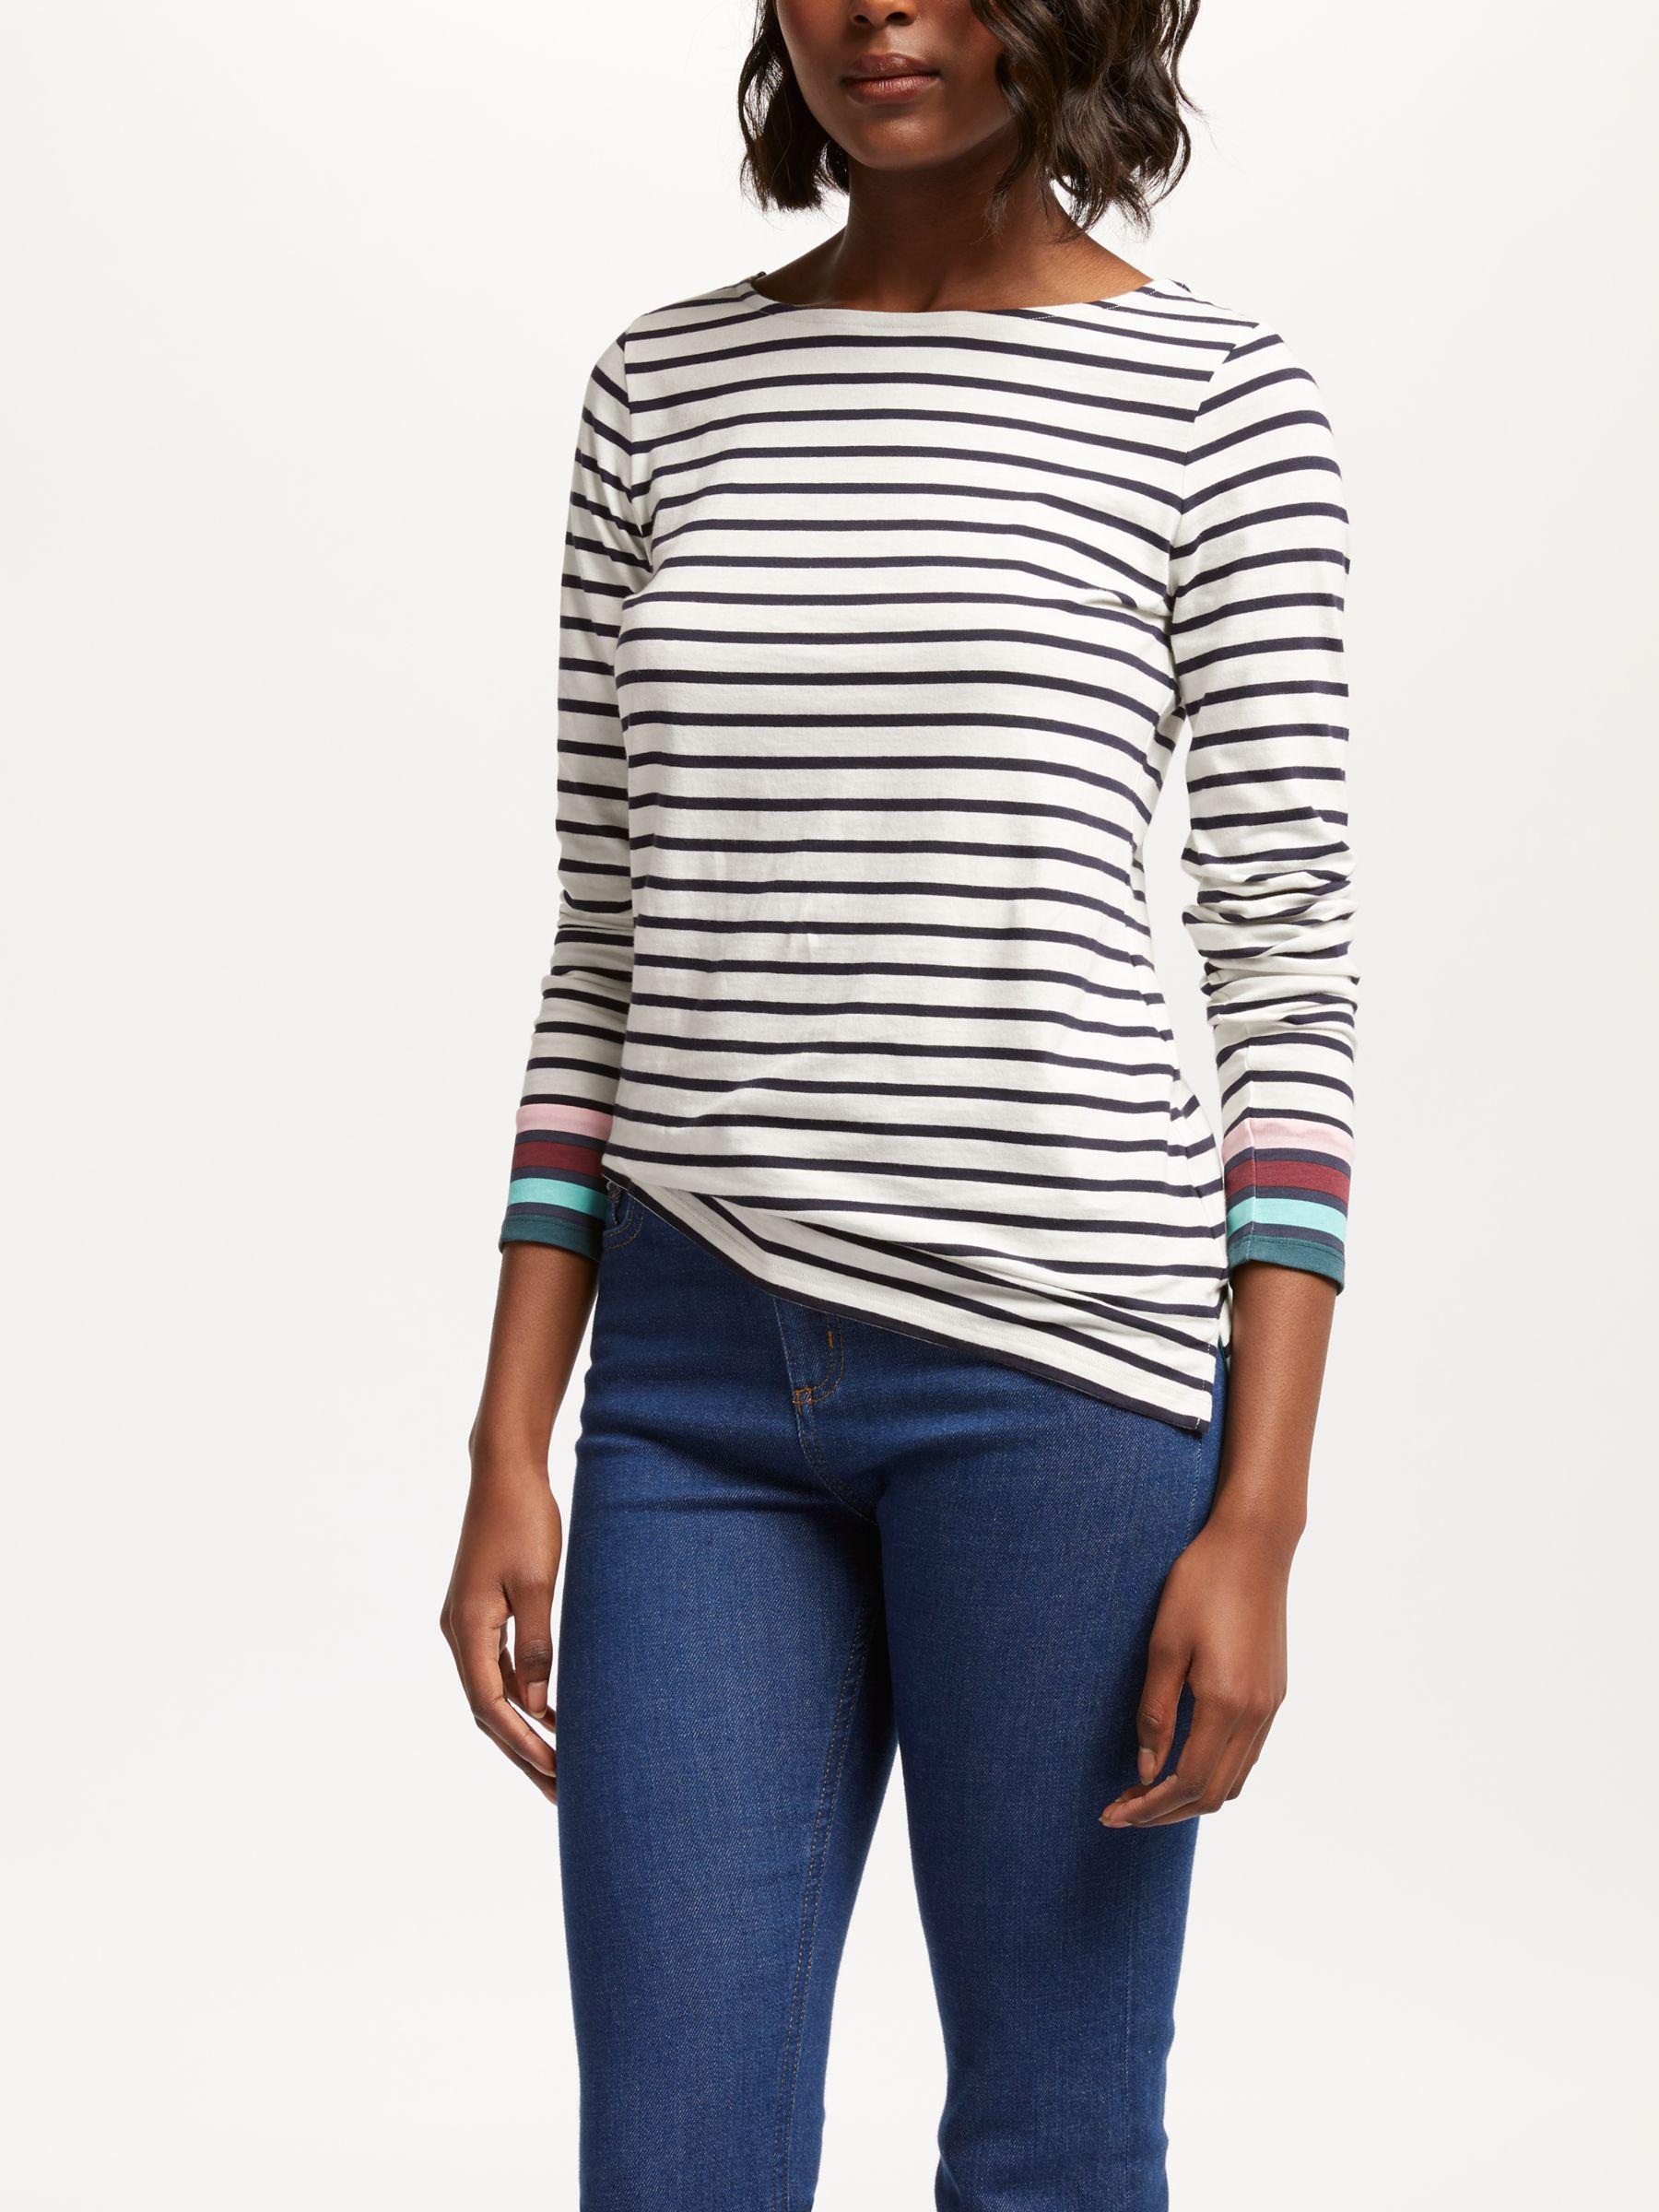 5b96a80b14 Boden. Women's Long Sleeve Breton Top